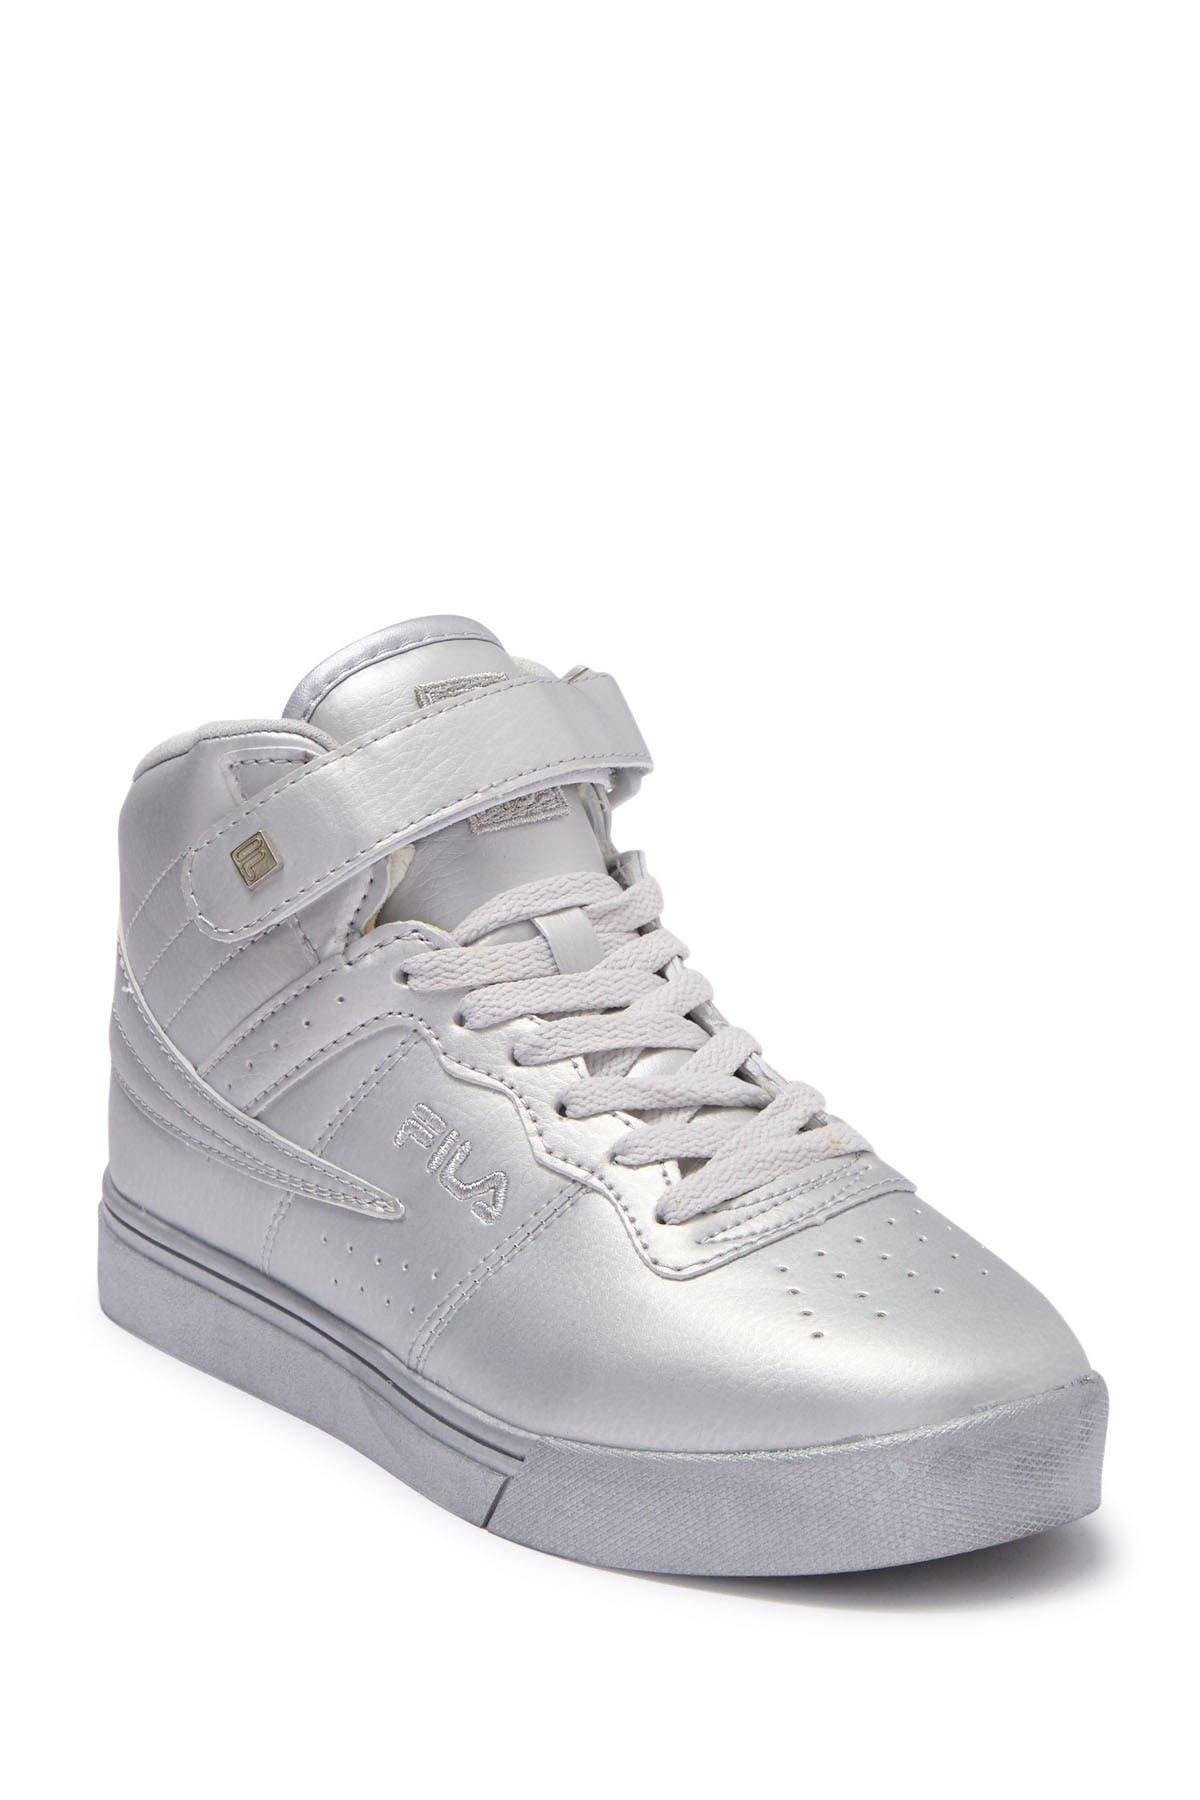 FILA USA | Vulc 13 Metallic Sneaker